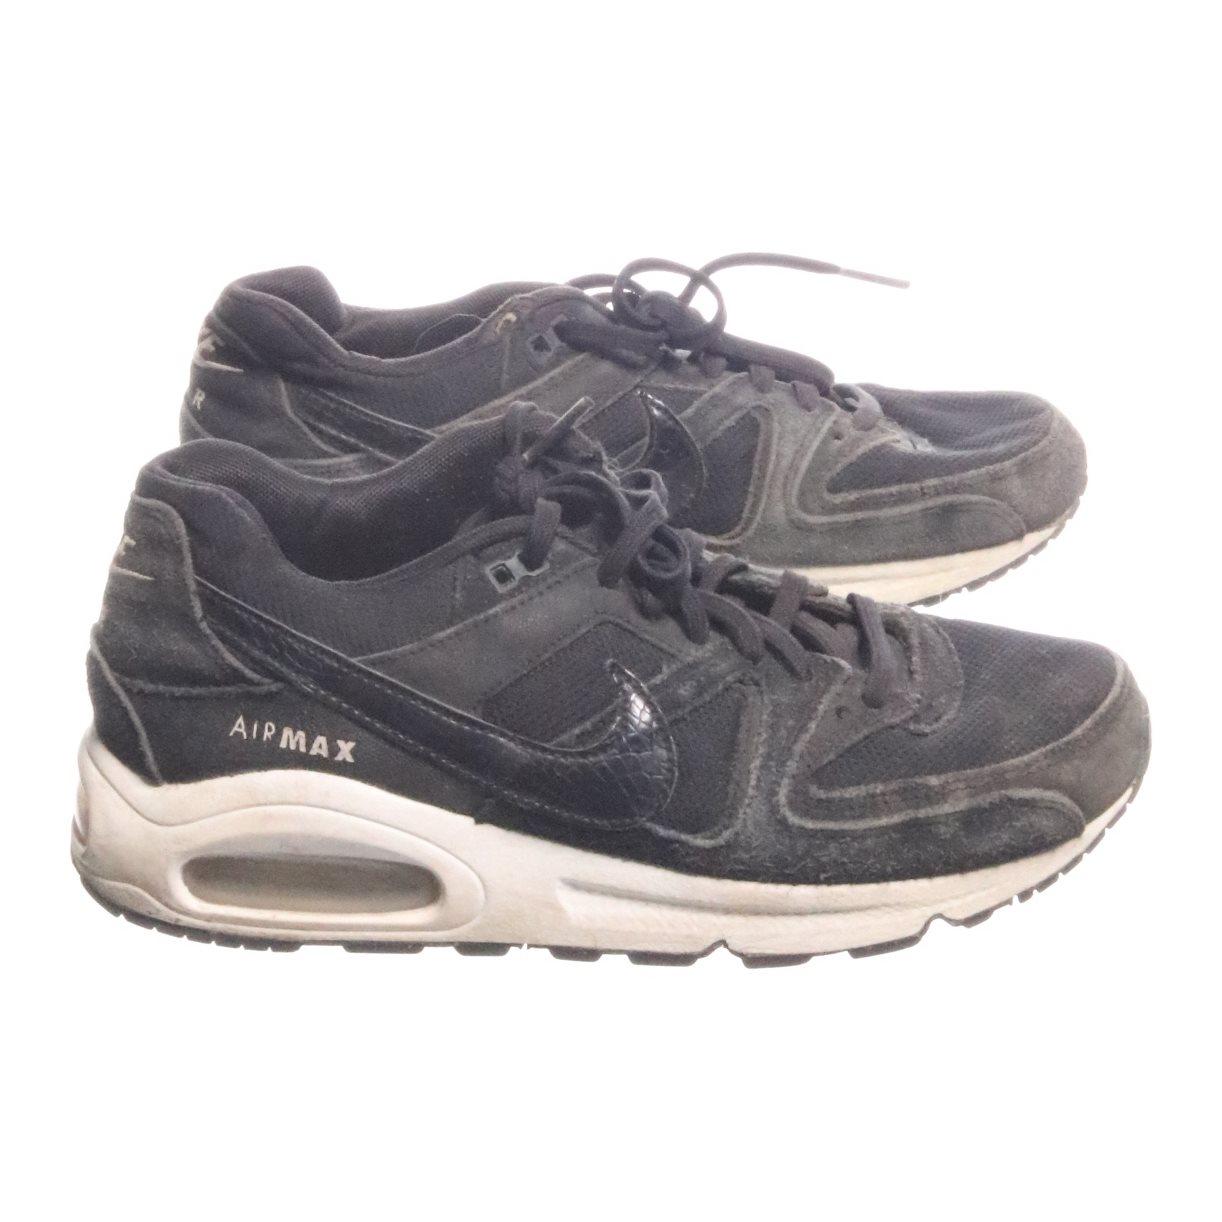 promo code f931d b384a Nike, Sneakers, Strl  38, Airmax, Svart Vit